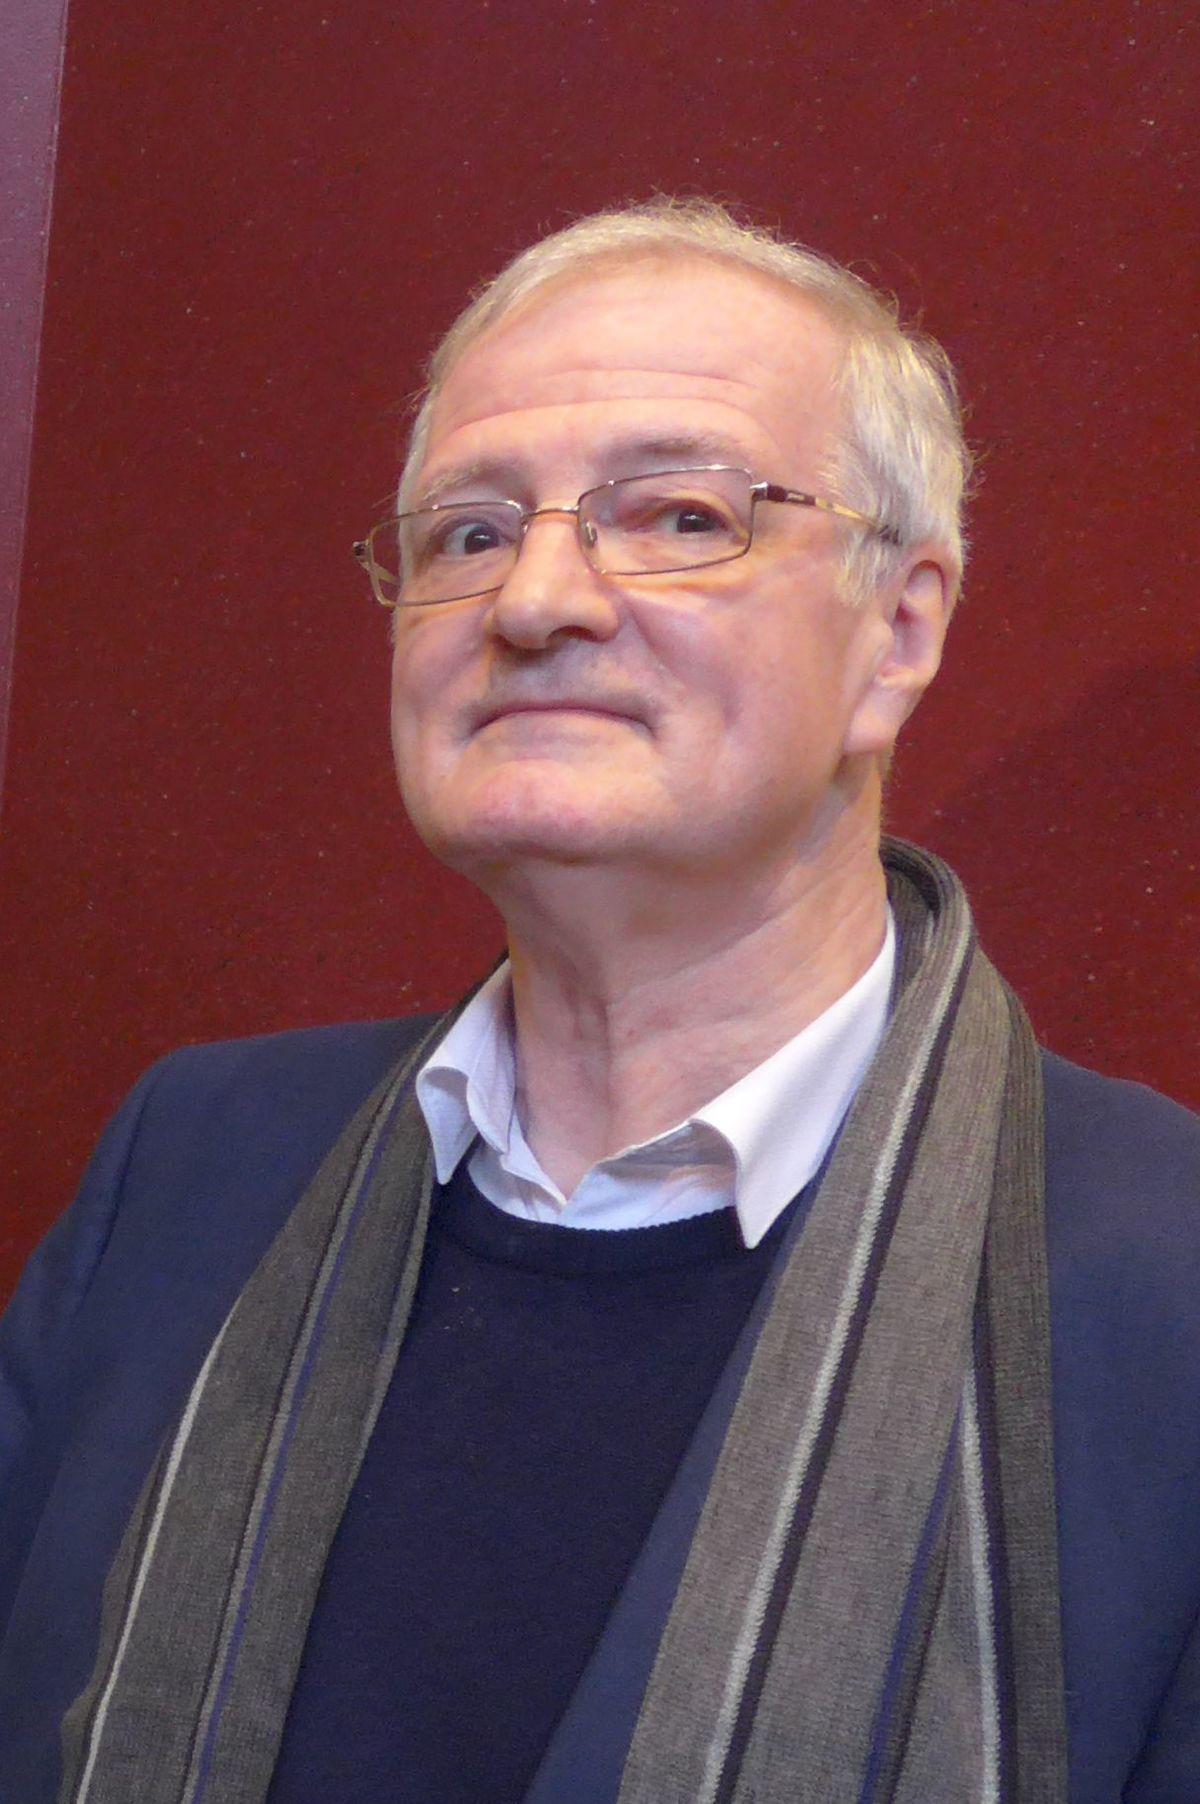 James Morwood Wikipedia